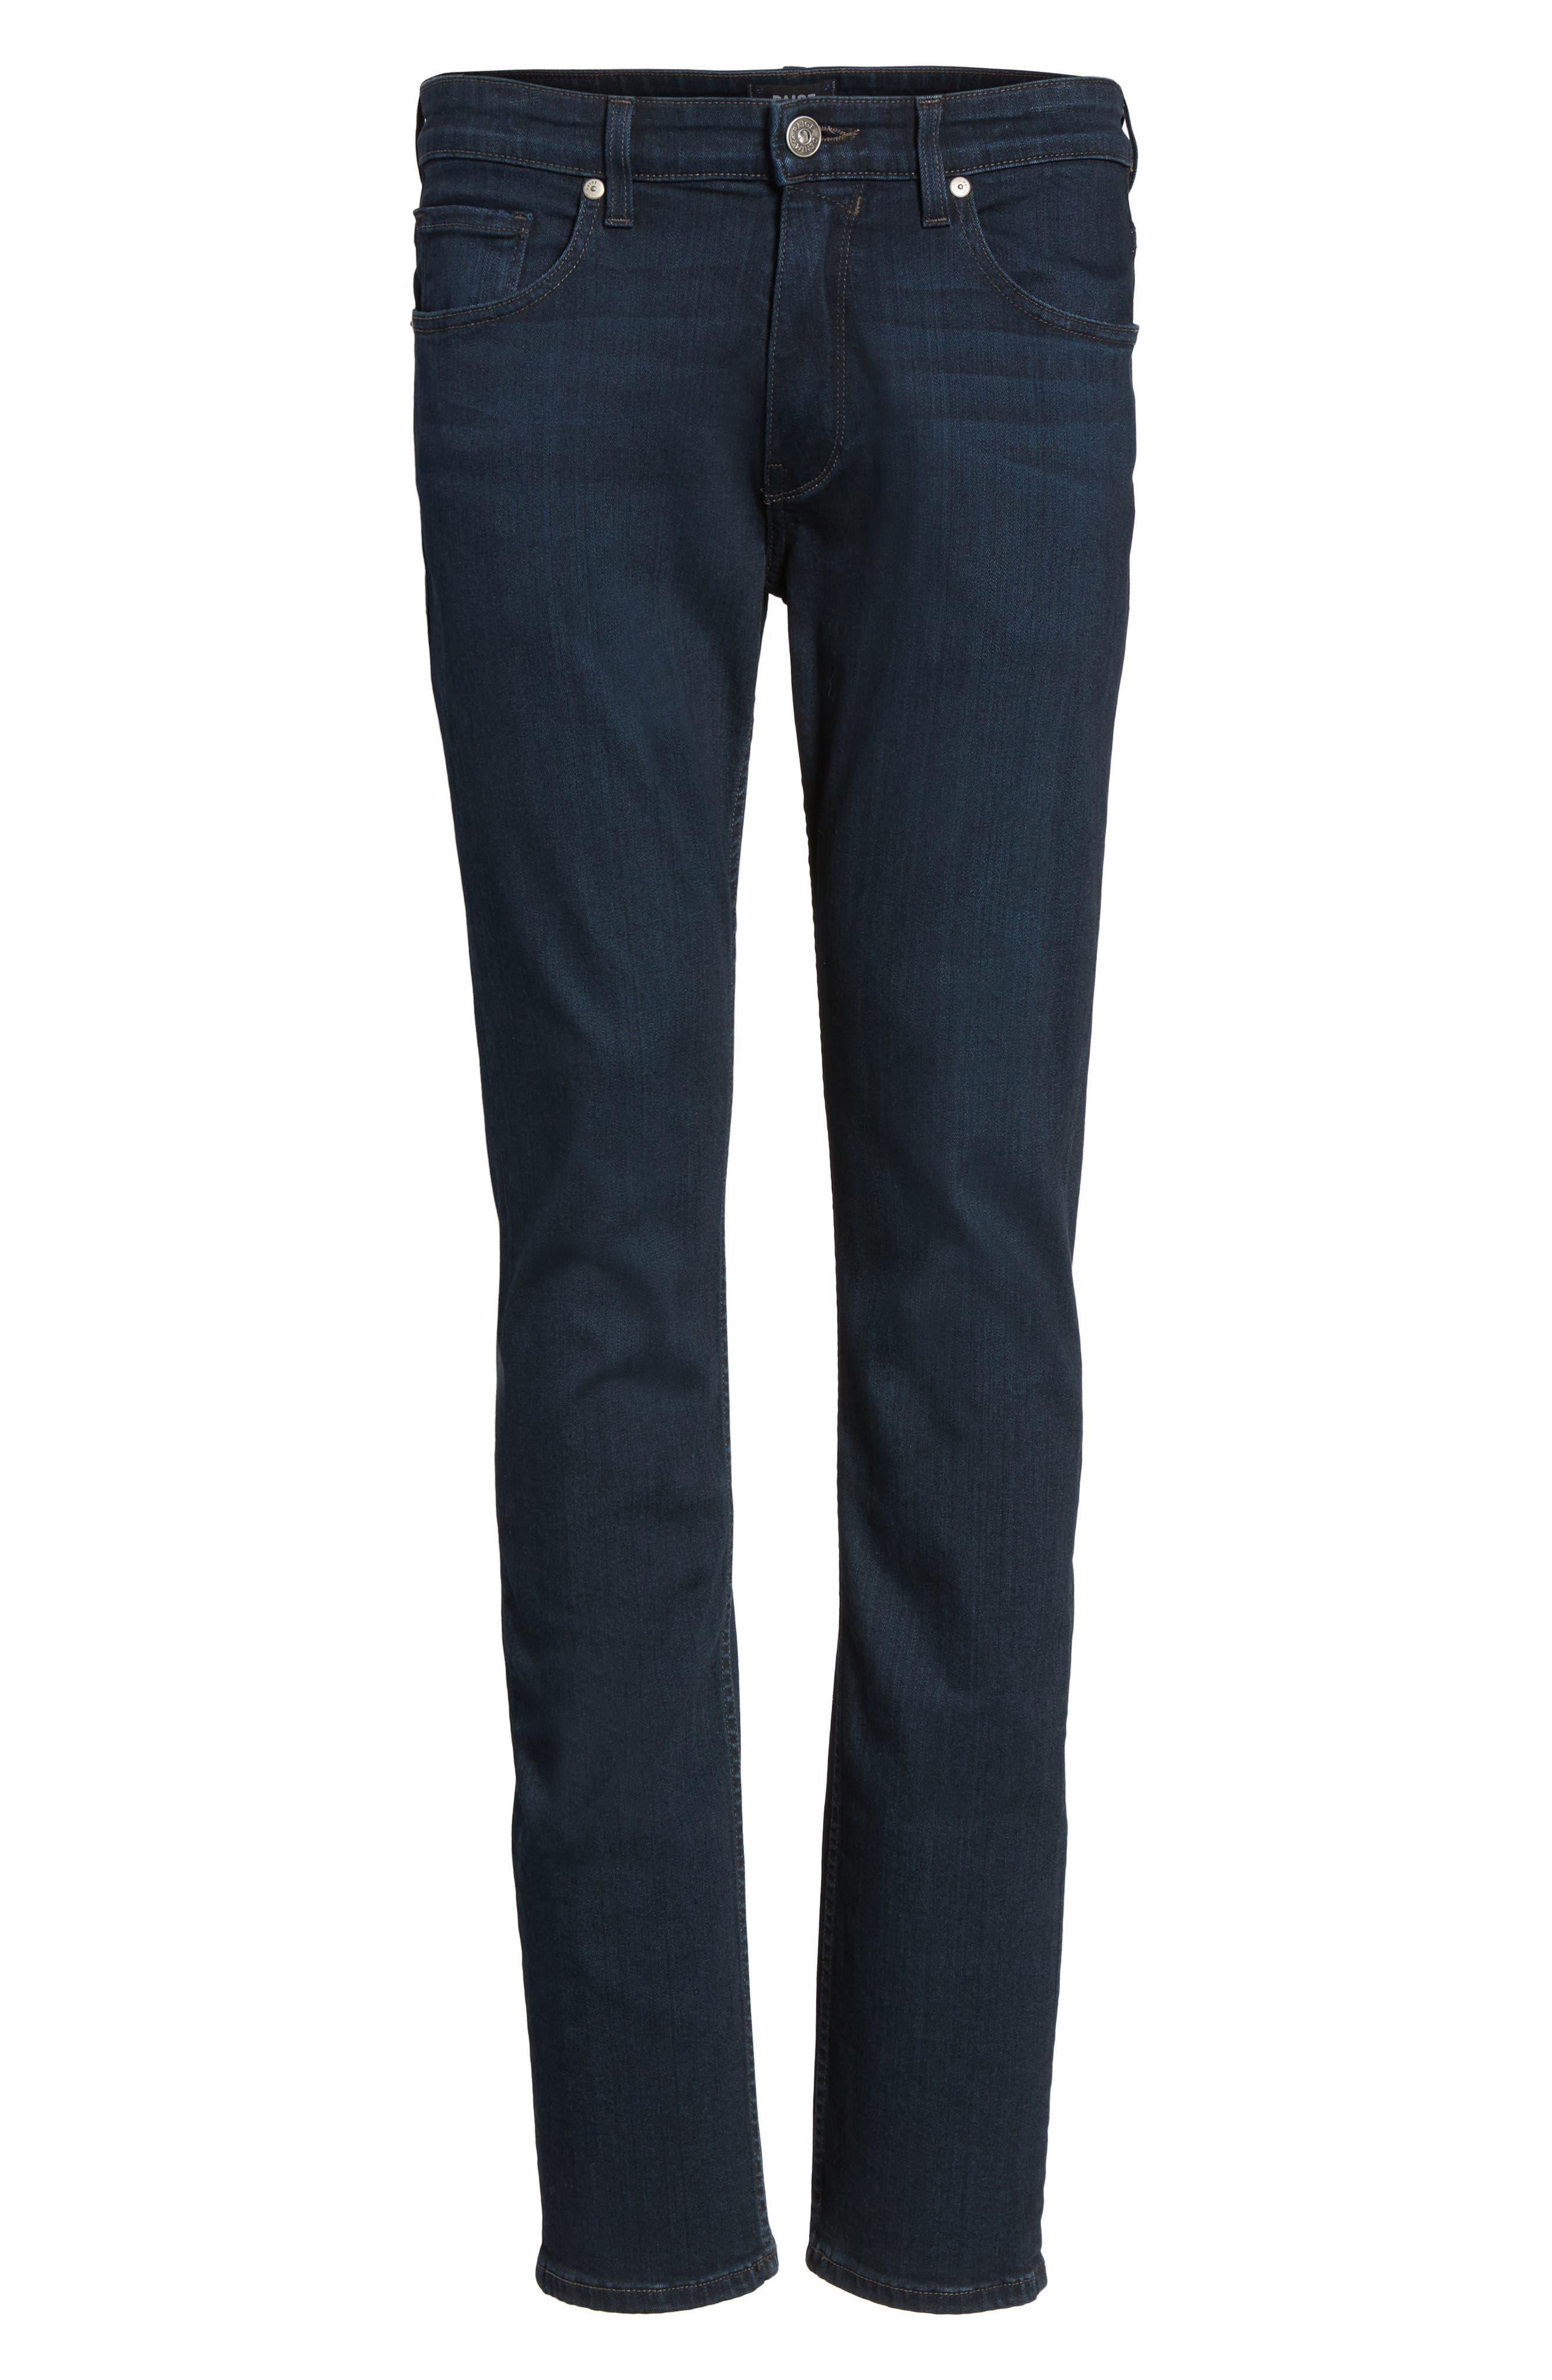 PAIGE, Normandie Straight Leg Jeans, Alternate thumbnail 7, color, ARLO